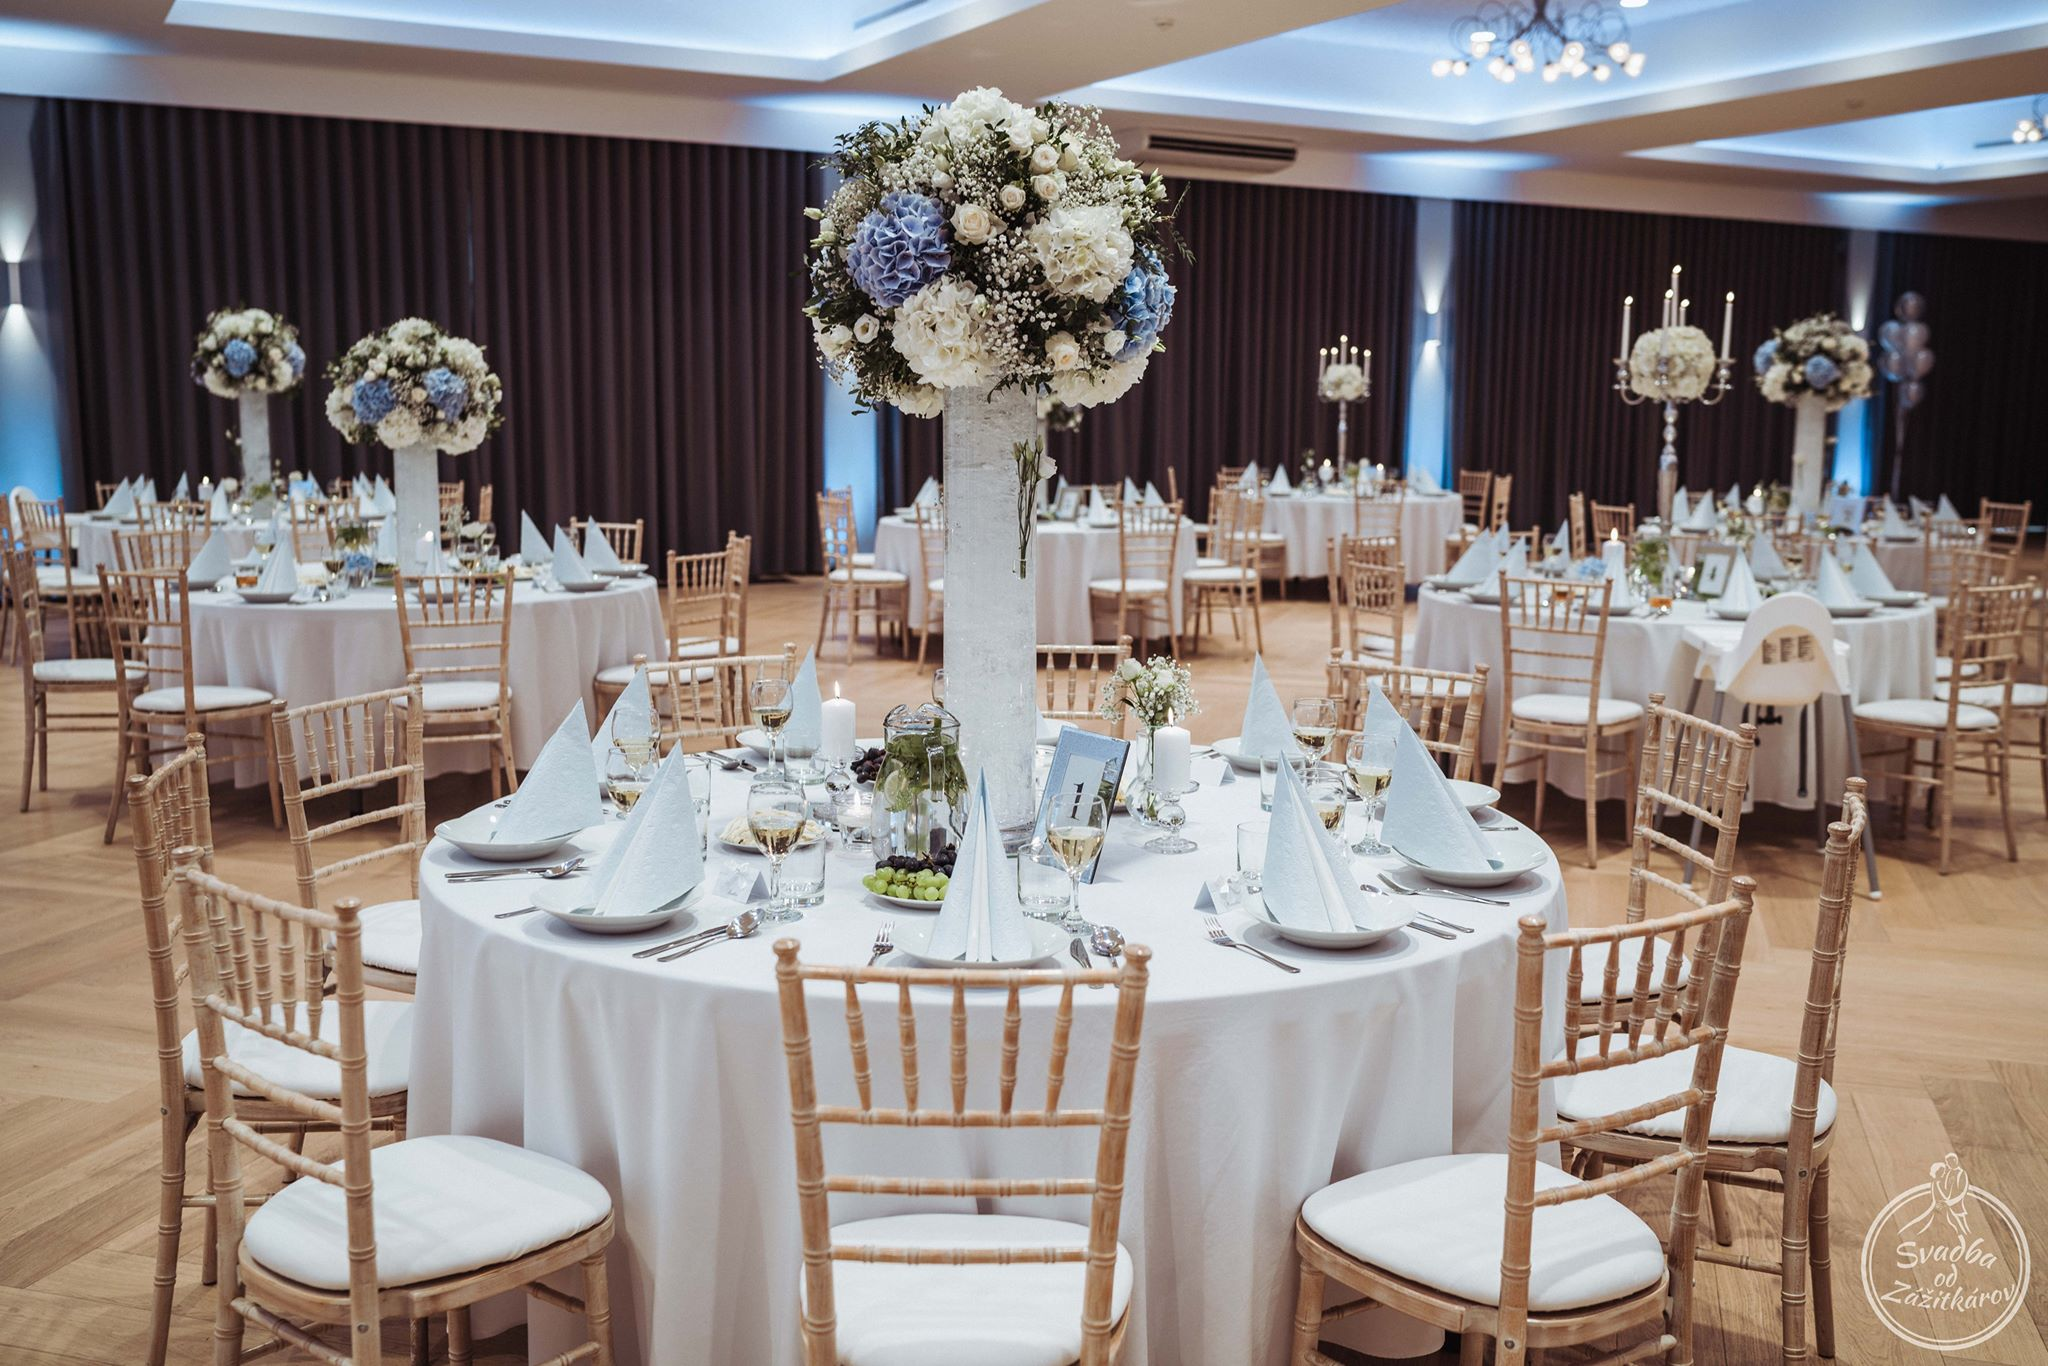 nasvietenie-saly-osvetlenie-svadba-dj-moderator-weddingjpg